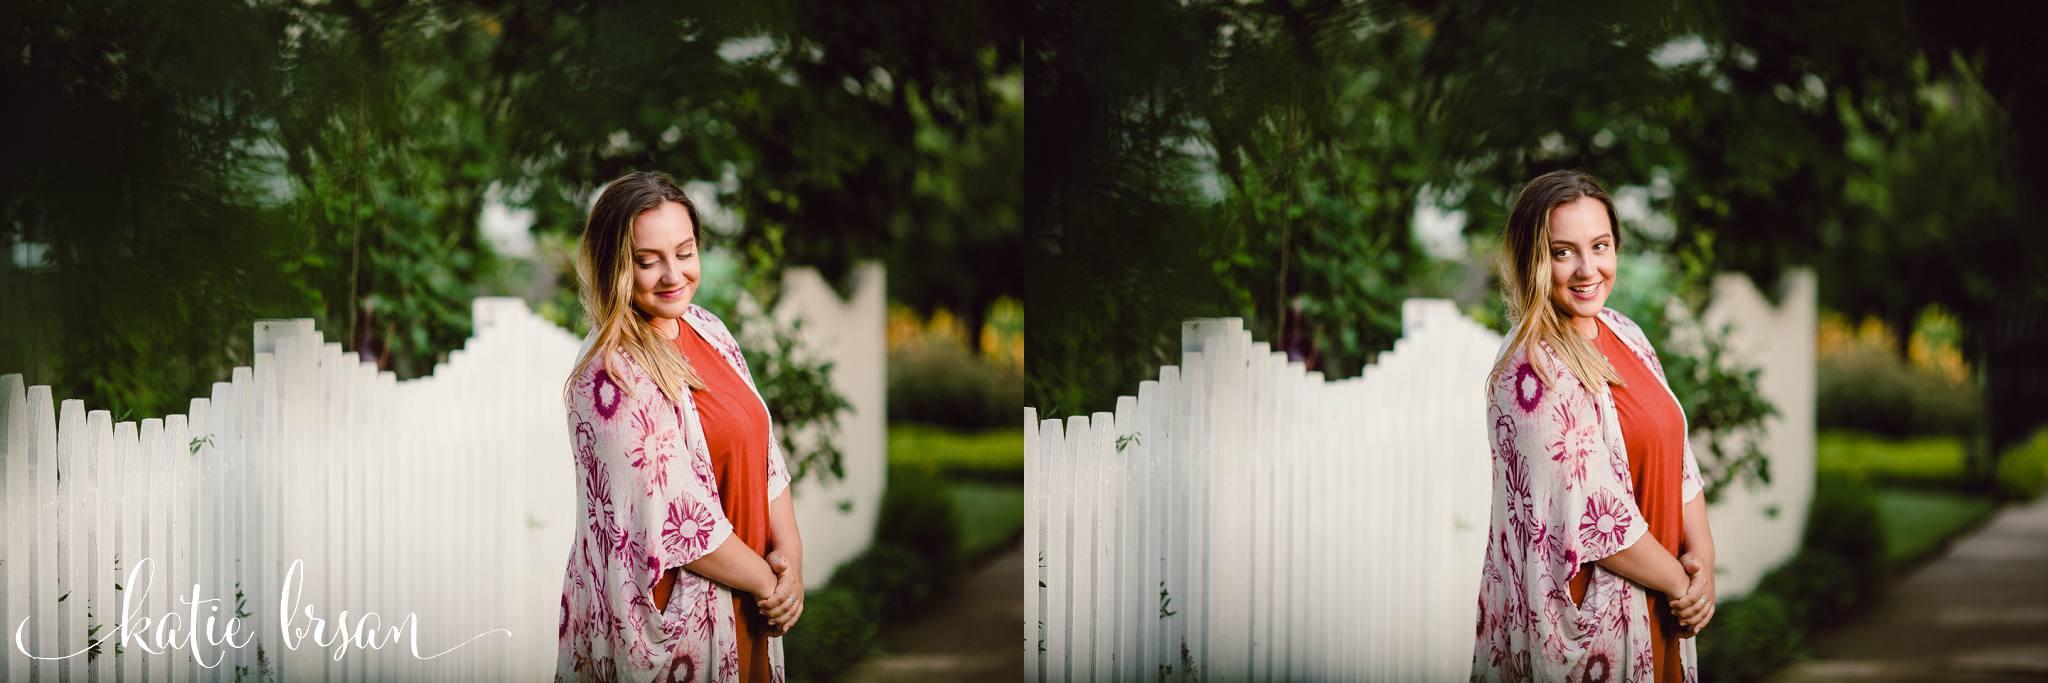 SeniorPhotography-Downtown-Frankfort-TinleyParkHighSchool_0600.jpg